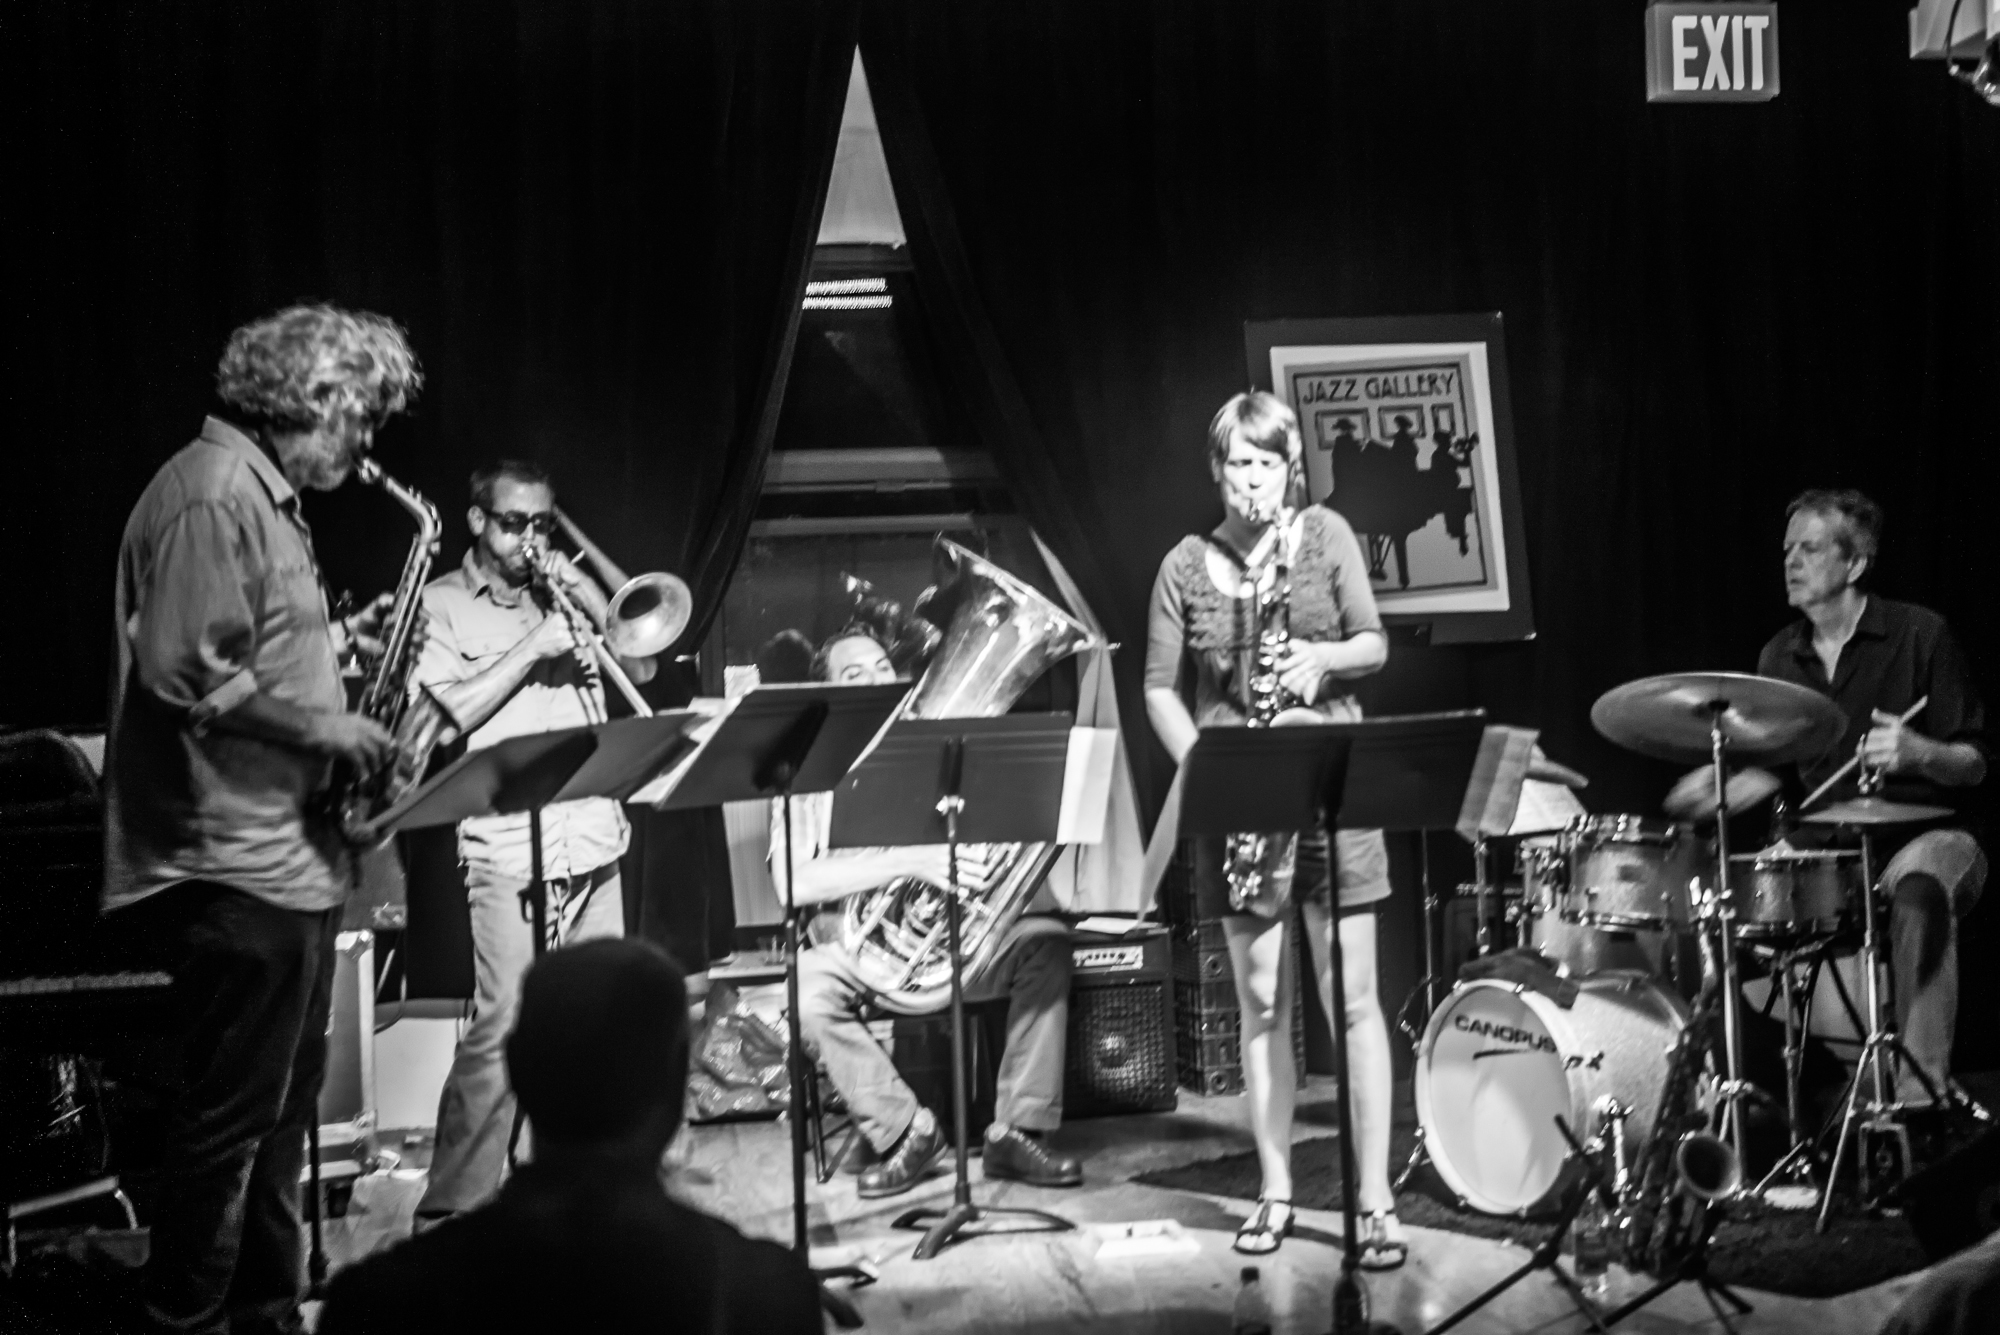 Tim Berne, Ben Gerstein, Dan Peck, Ingrid Laubrock and Tom Rainey at the Jazz Gallery in New York City